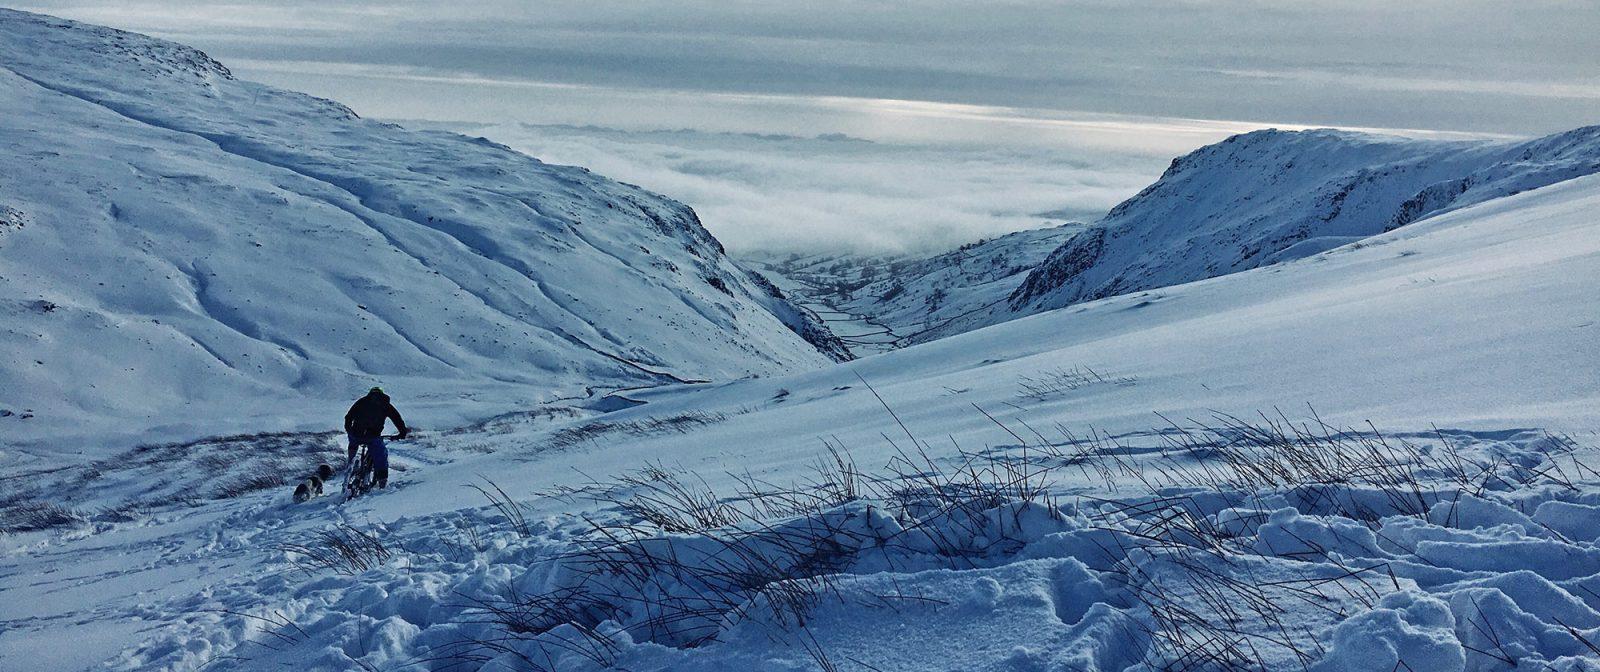 lakesmtb-snow-descent